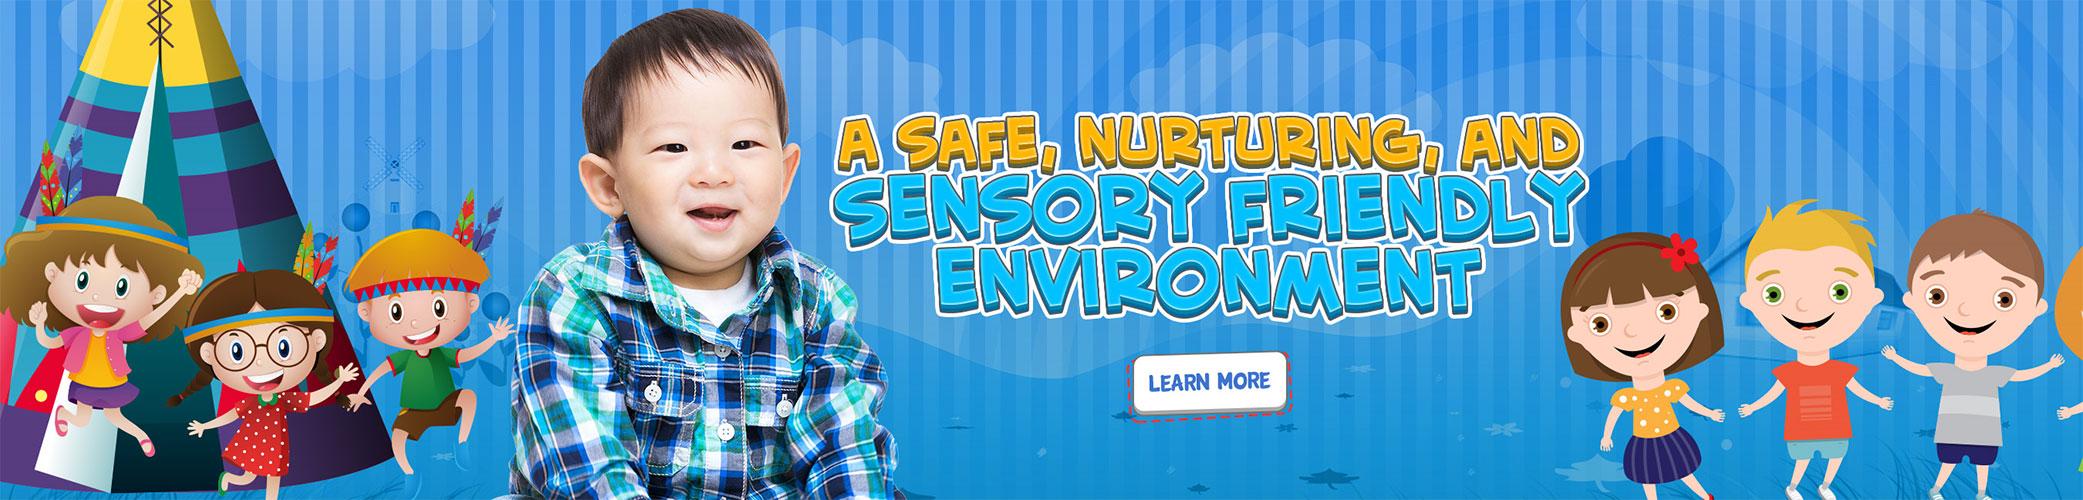 WRTS Edwardsville/ Safe and Nurturing/ Sensory Friendly Environment